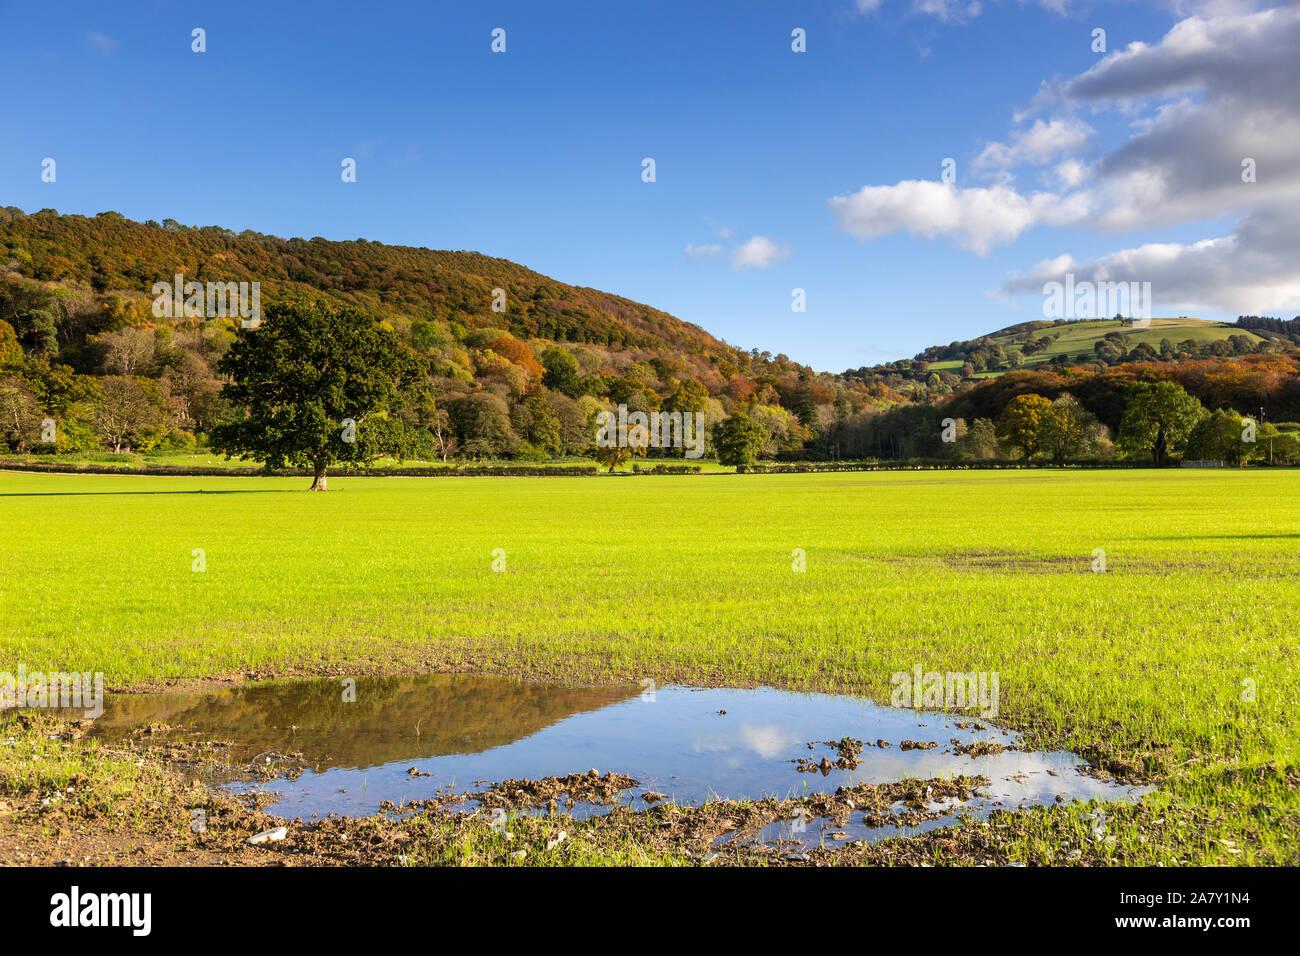 Waterlogged field near Llanwrst, North Wales Stock Photo